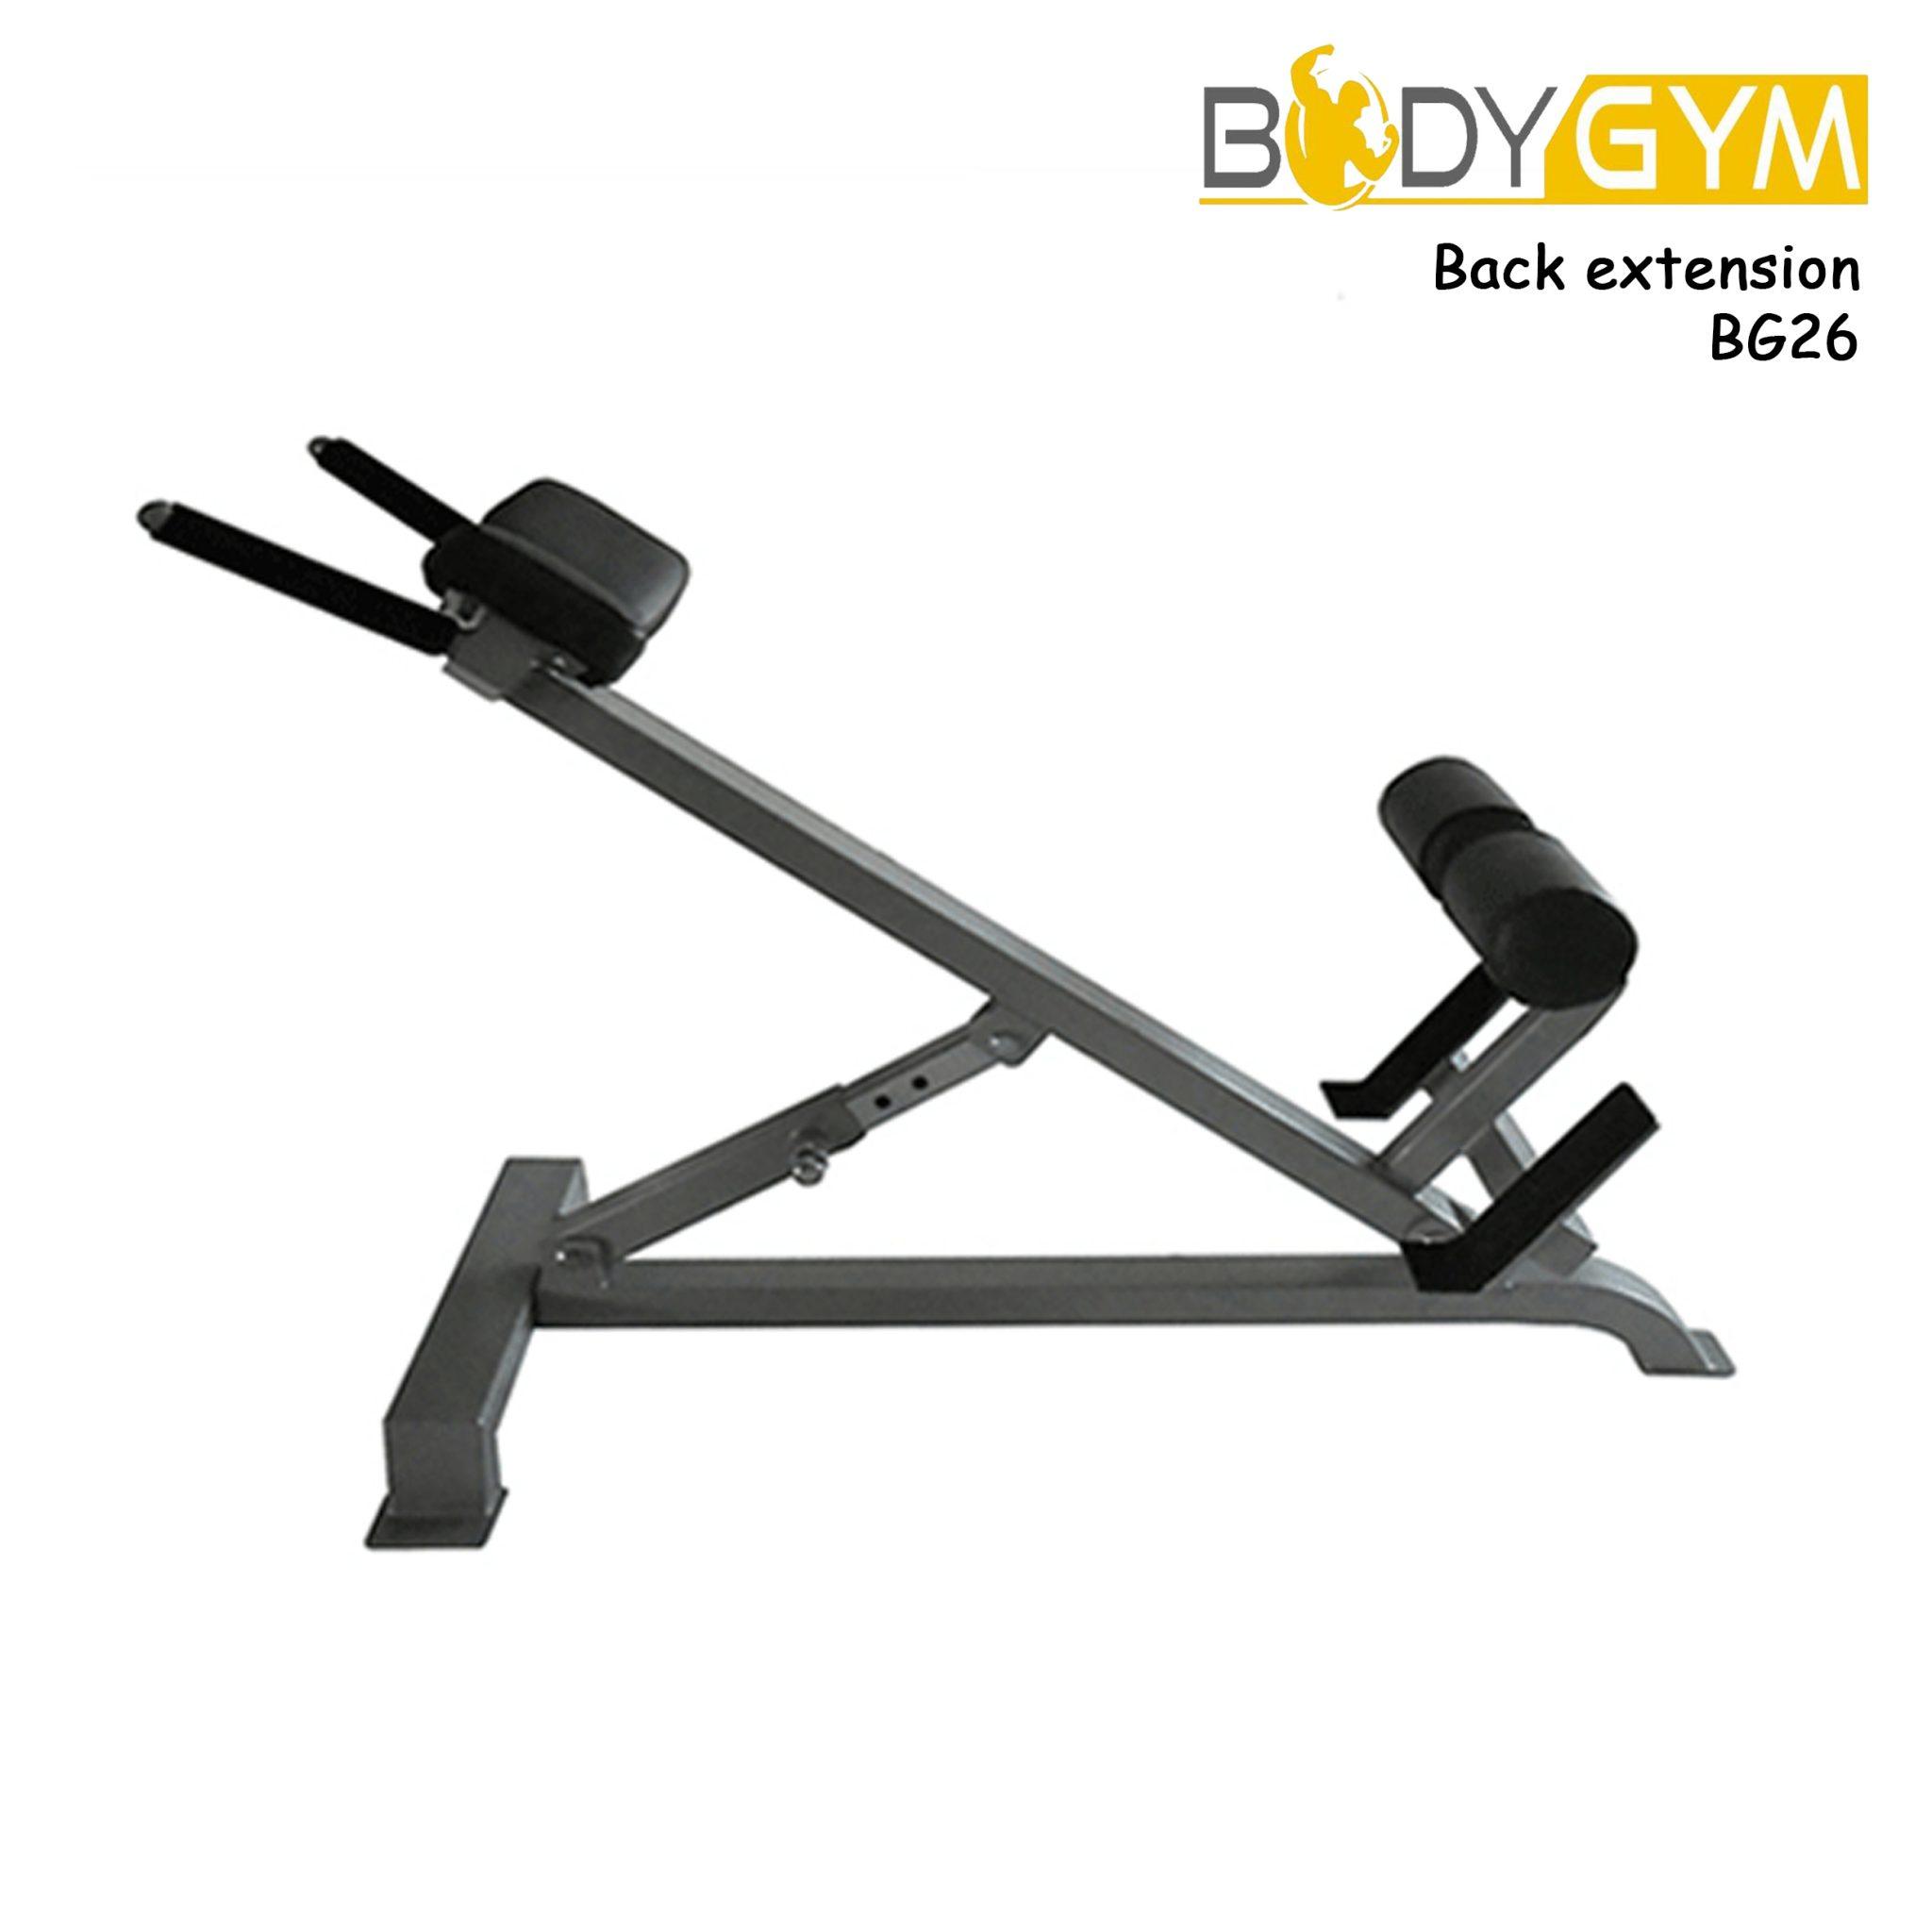 BG26 Back extension 2 - Body Gym Extension ( Lokal ) - BG26